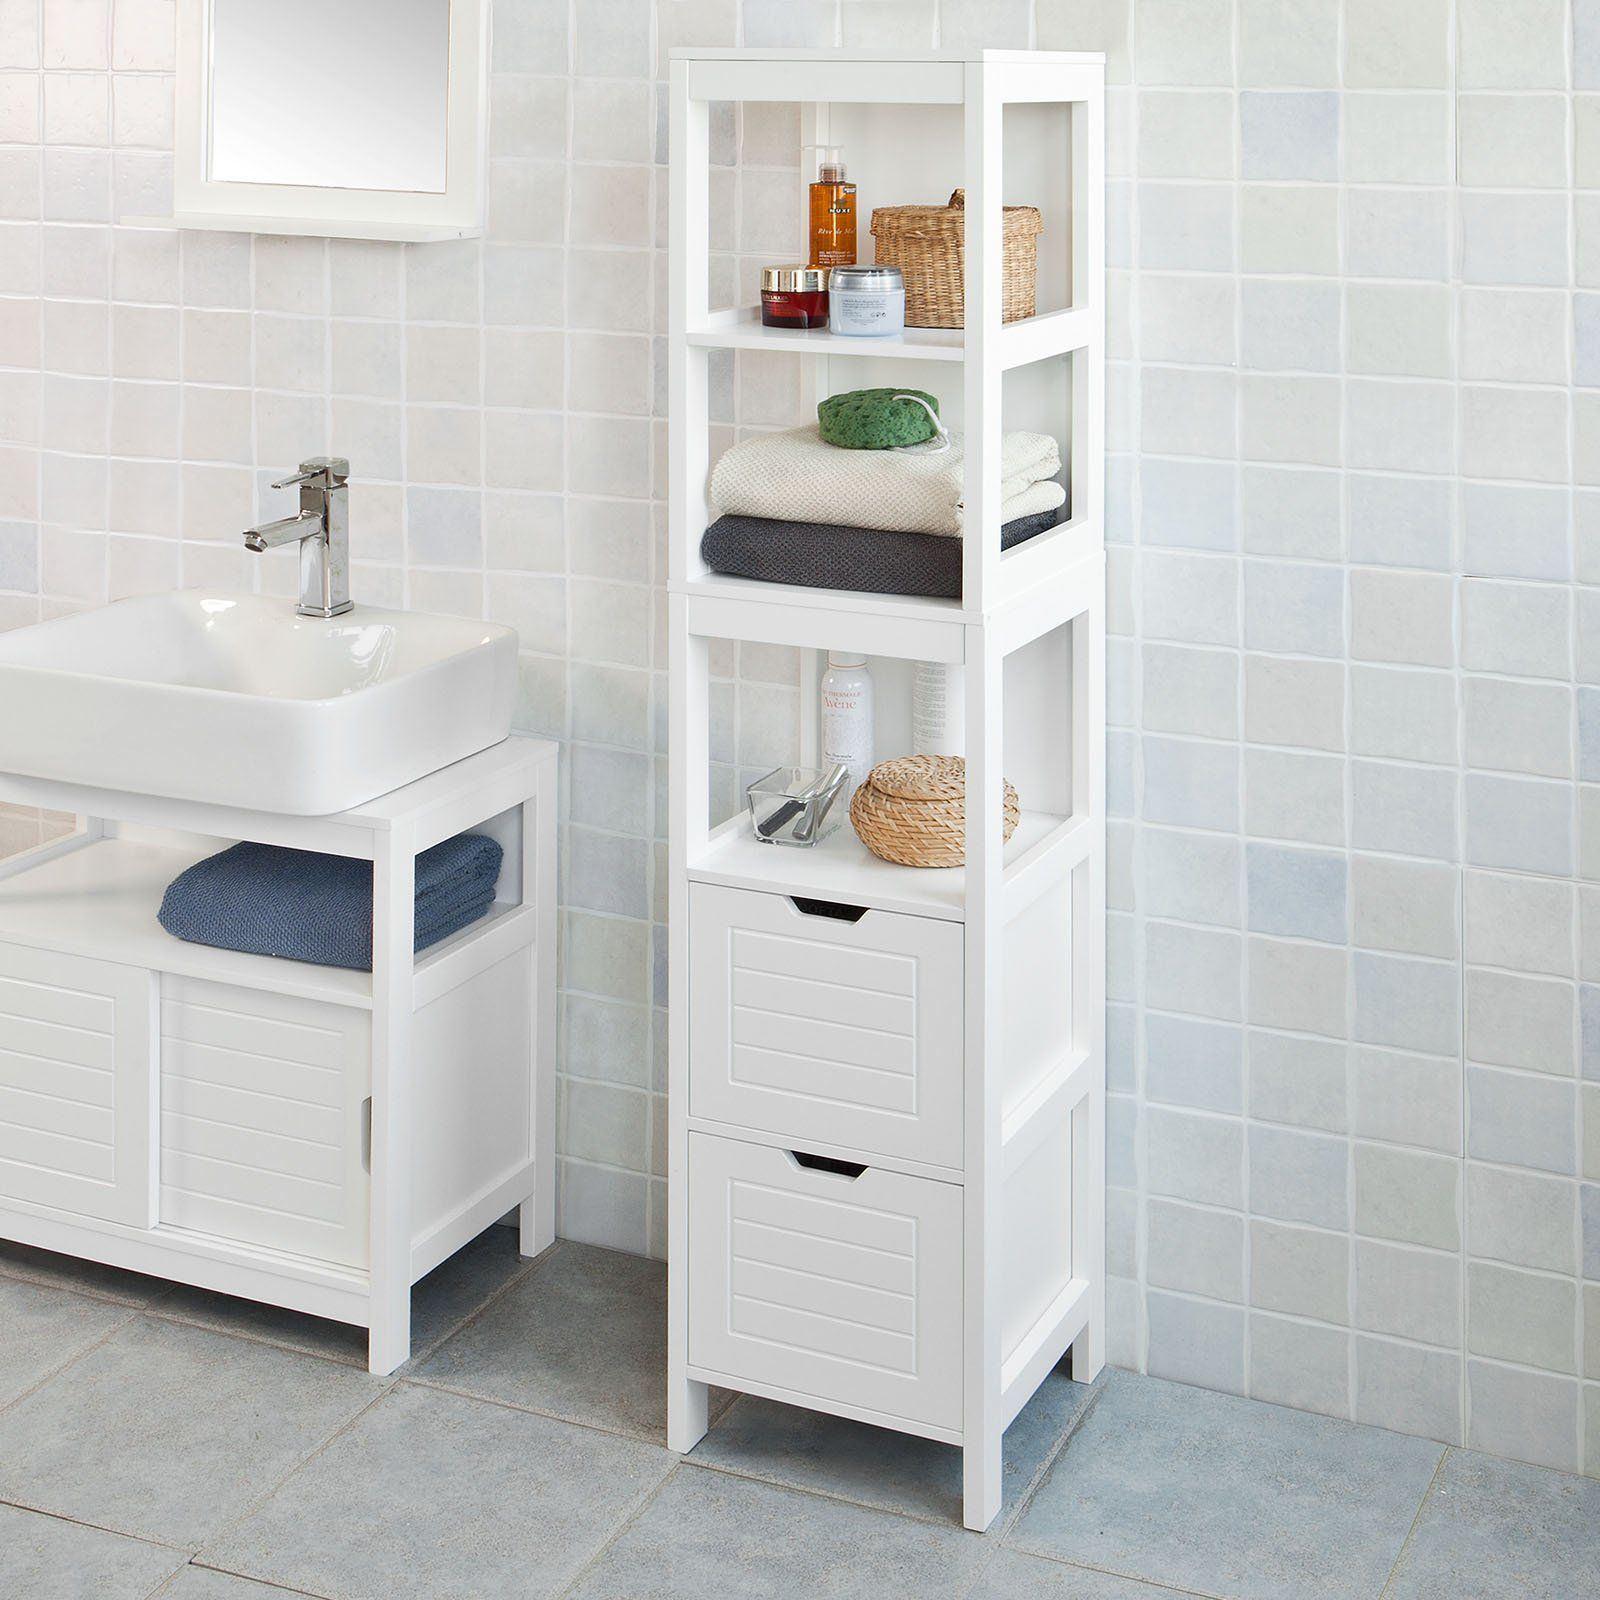 bathroom storage closet bathroom storage bins bathroom storage closet linen  cabinets for bathroom small bathroom towel